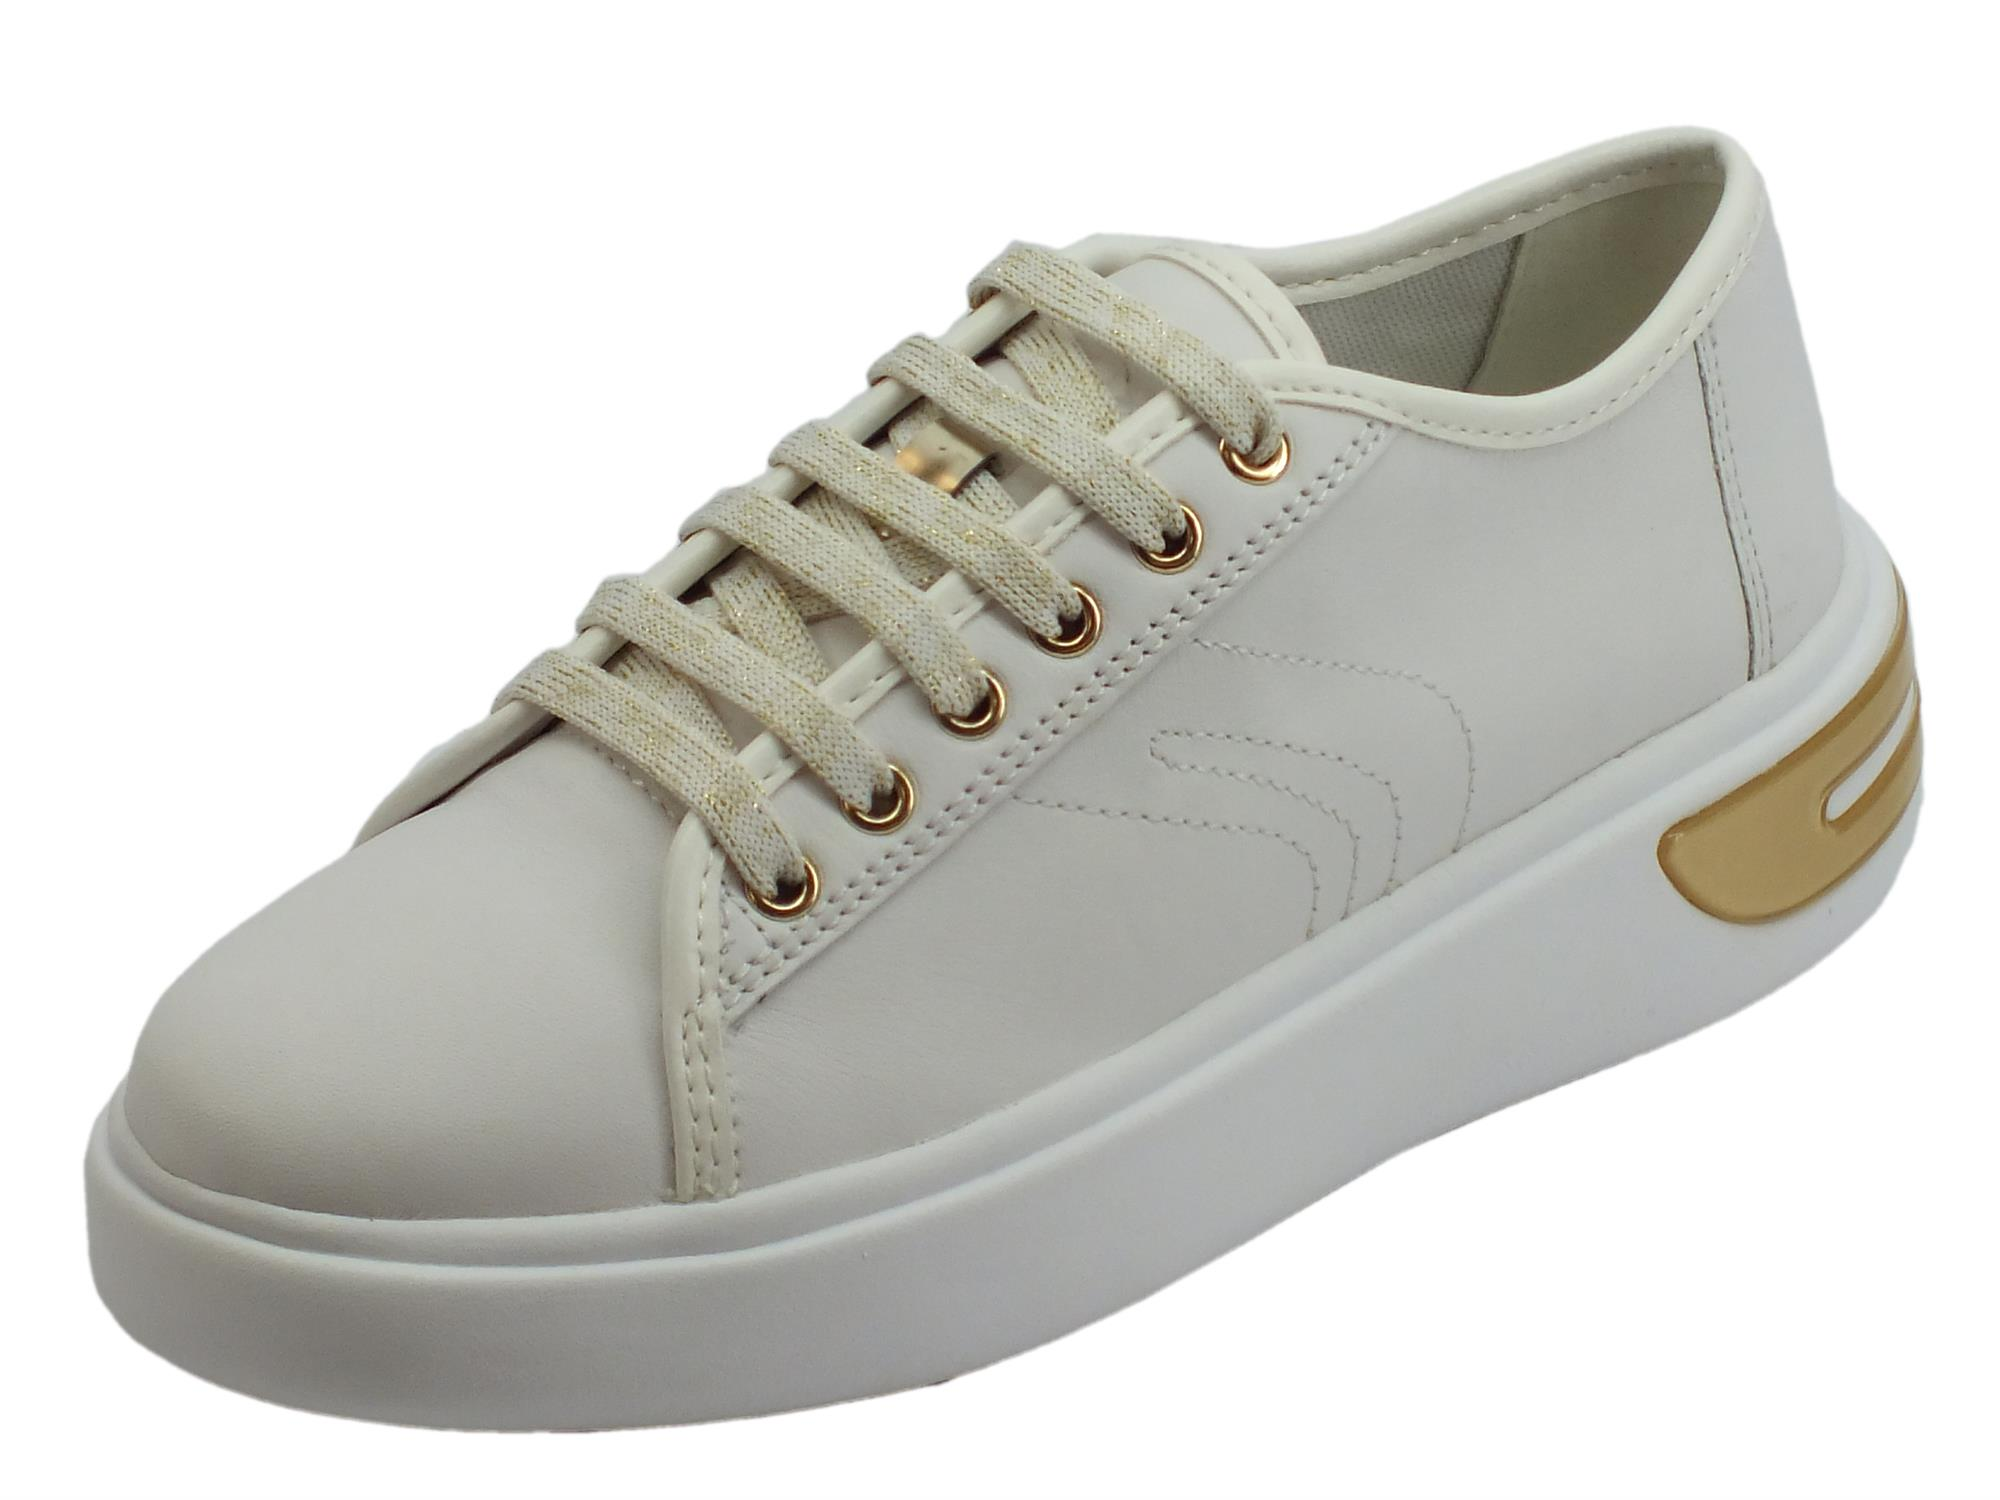 Geox D Ottaya sneakers sportive donna in nappa bianca zeppa bassa bombata